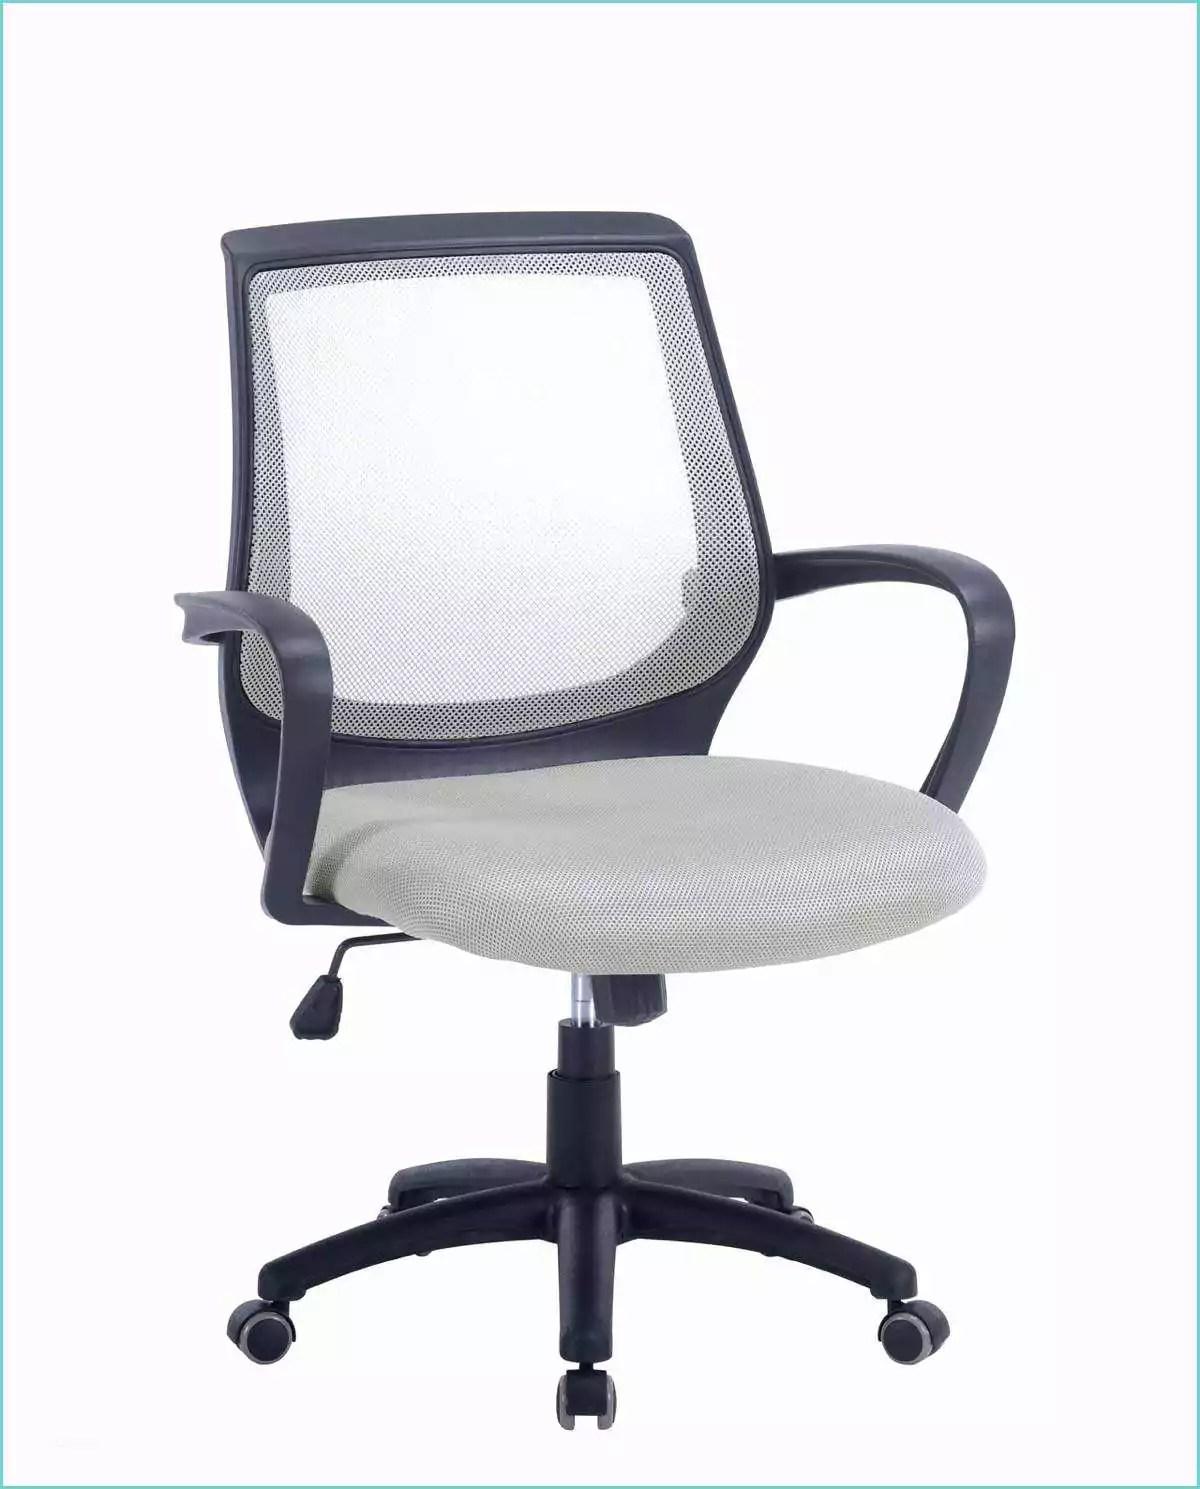 Chaise De Bureau Junior Ikea - Novocom.top